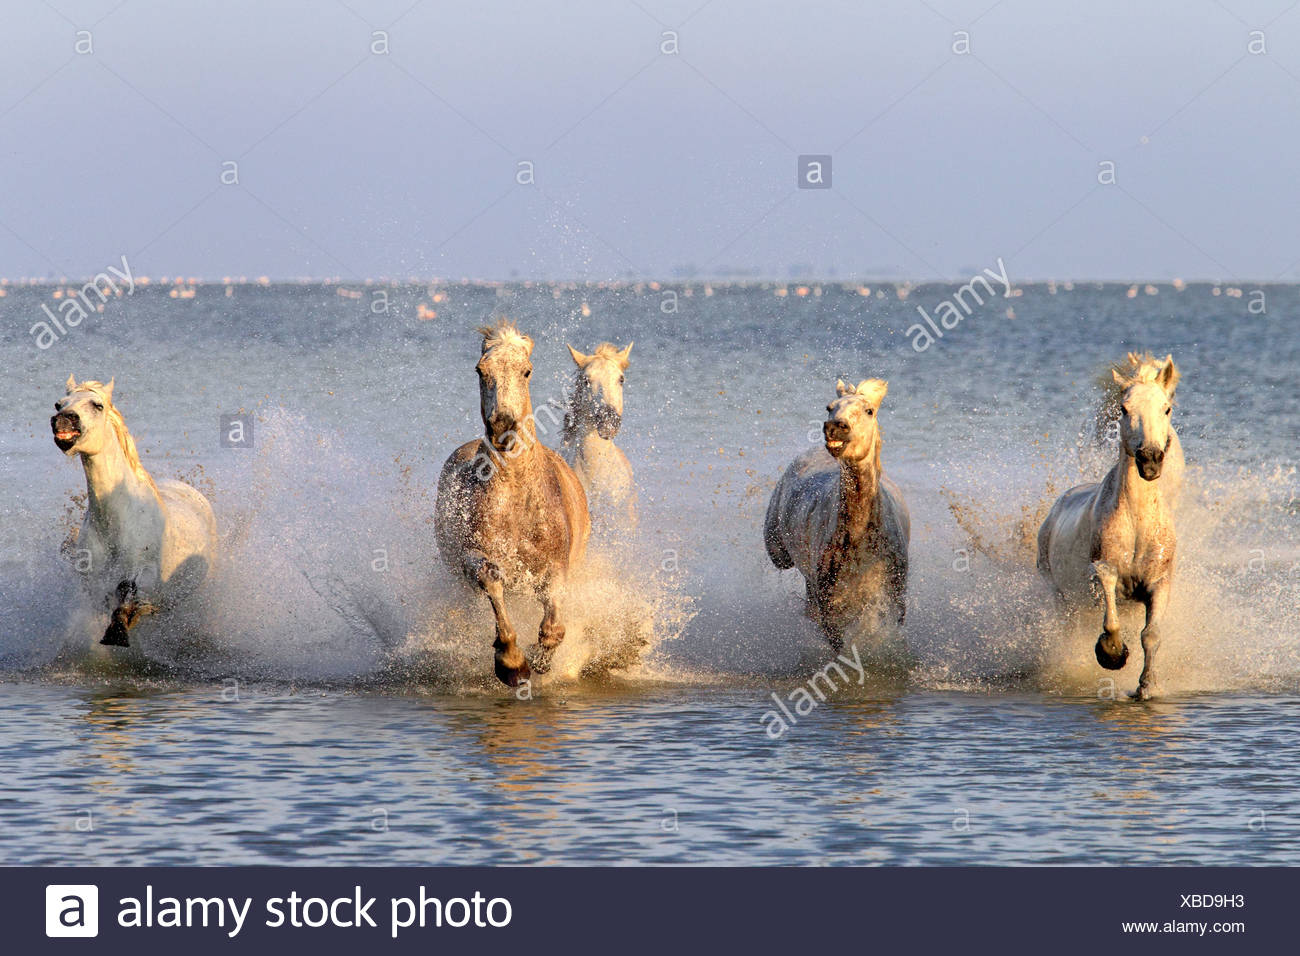 Camargue horses (Equus caballus), herd gallopping through water, Saintes-Marie-de-la-Mer, Camargue, France, Europe - Stock Image